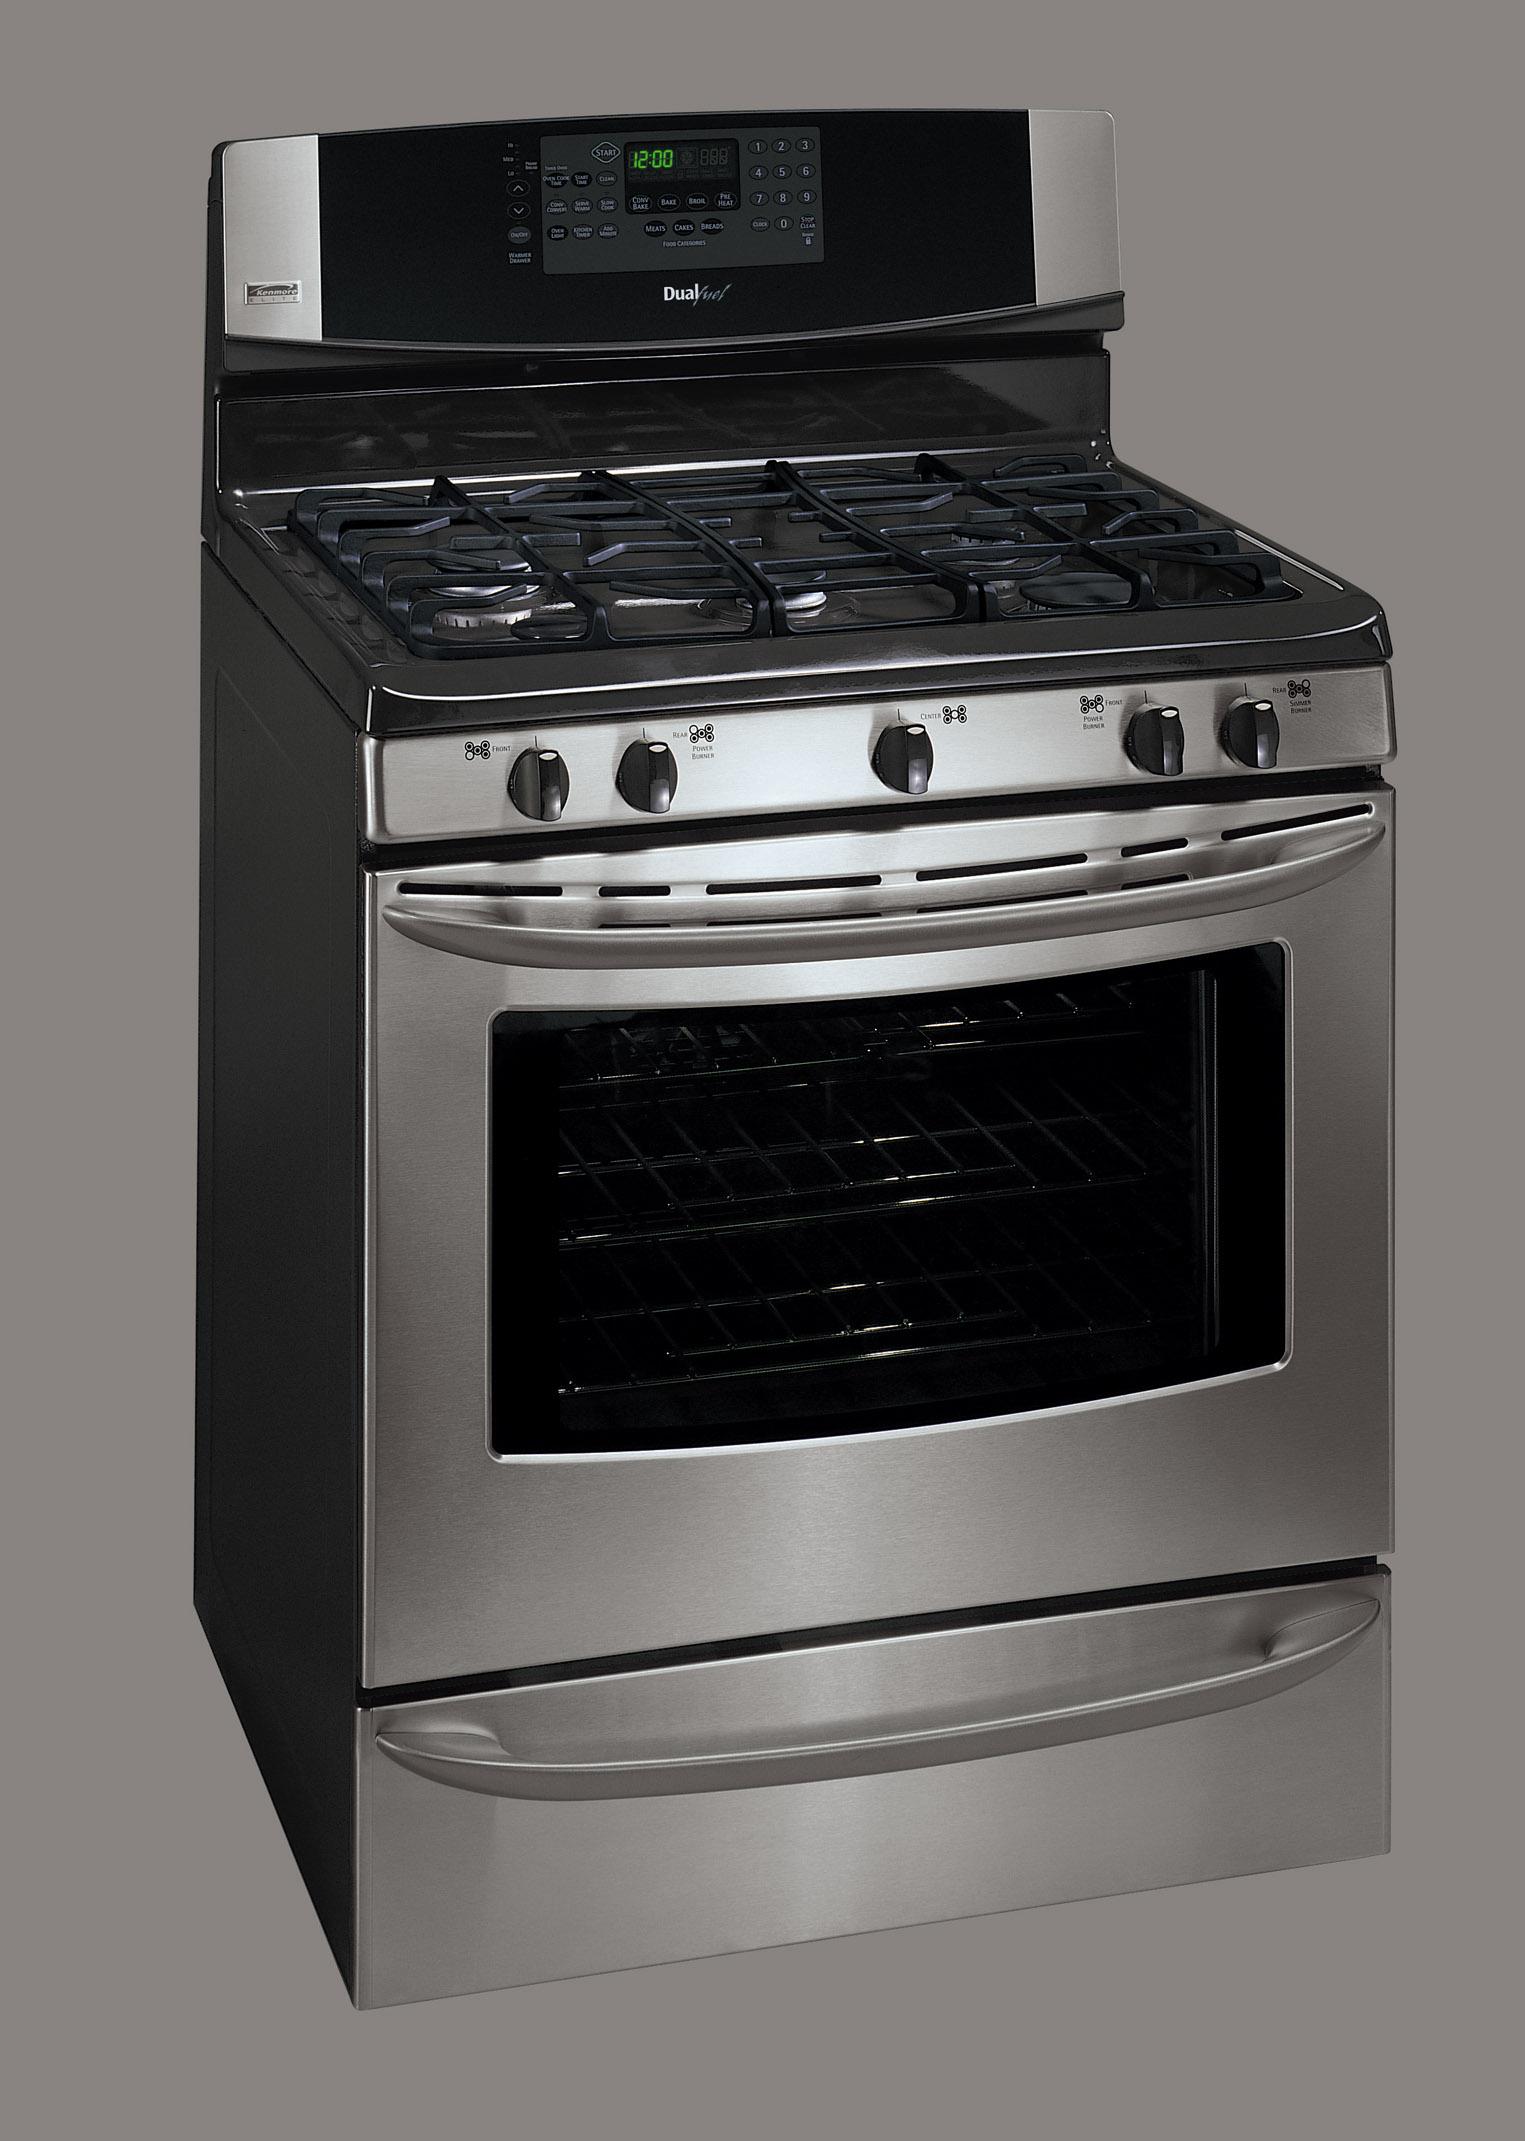 Kenmore Range/Stove/Oven Model 790.79383405 Parts